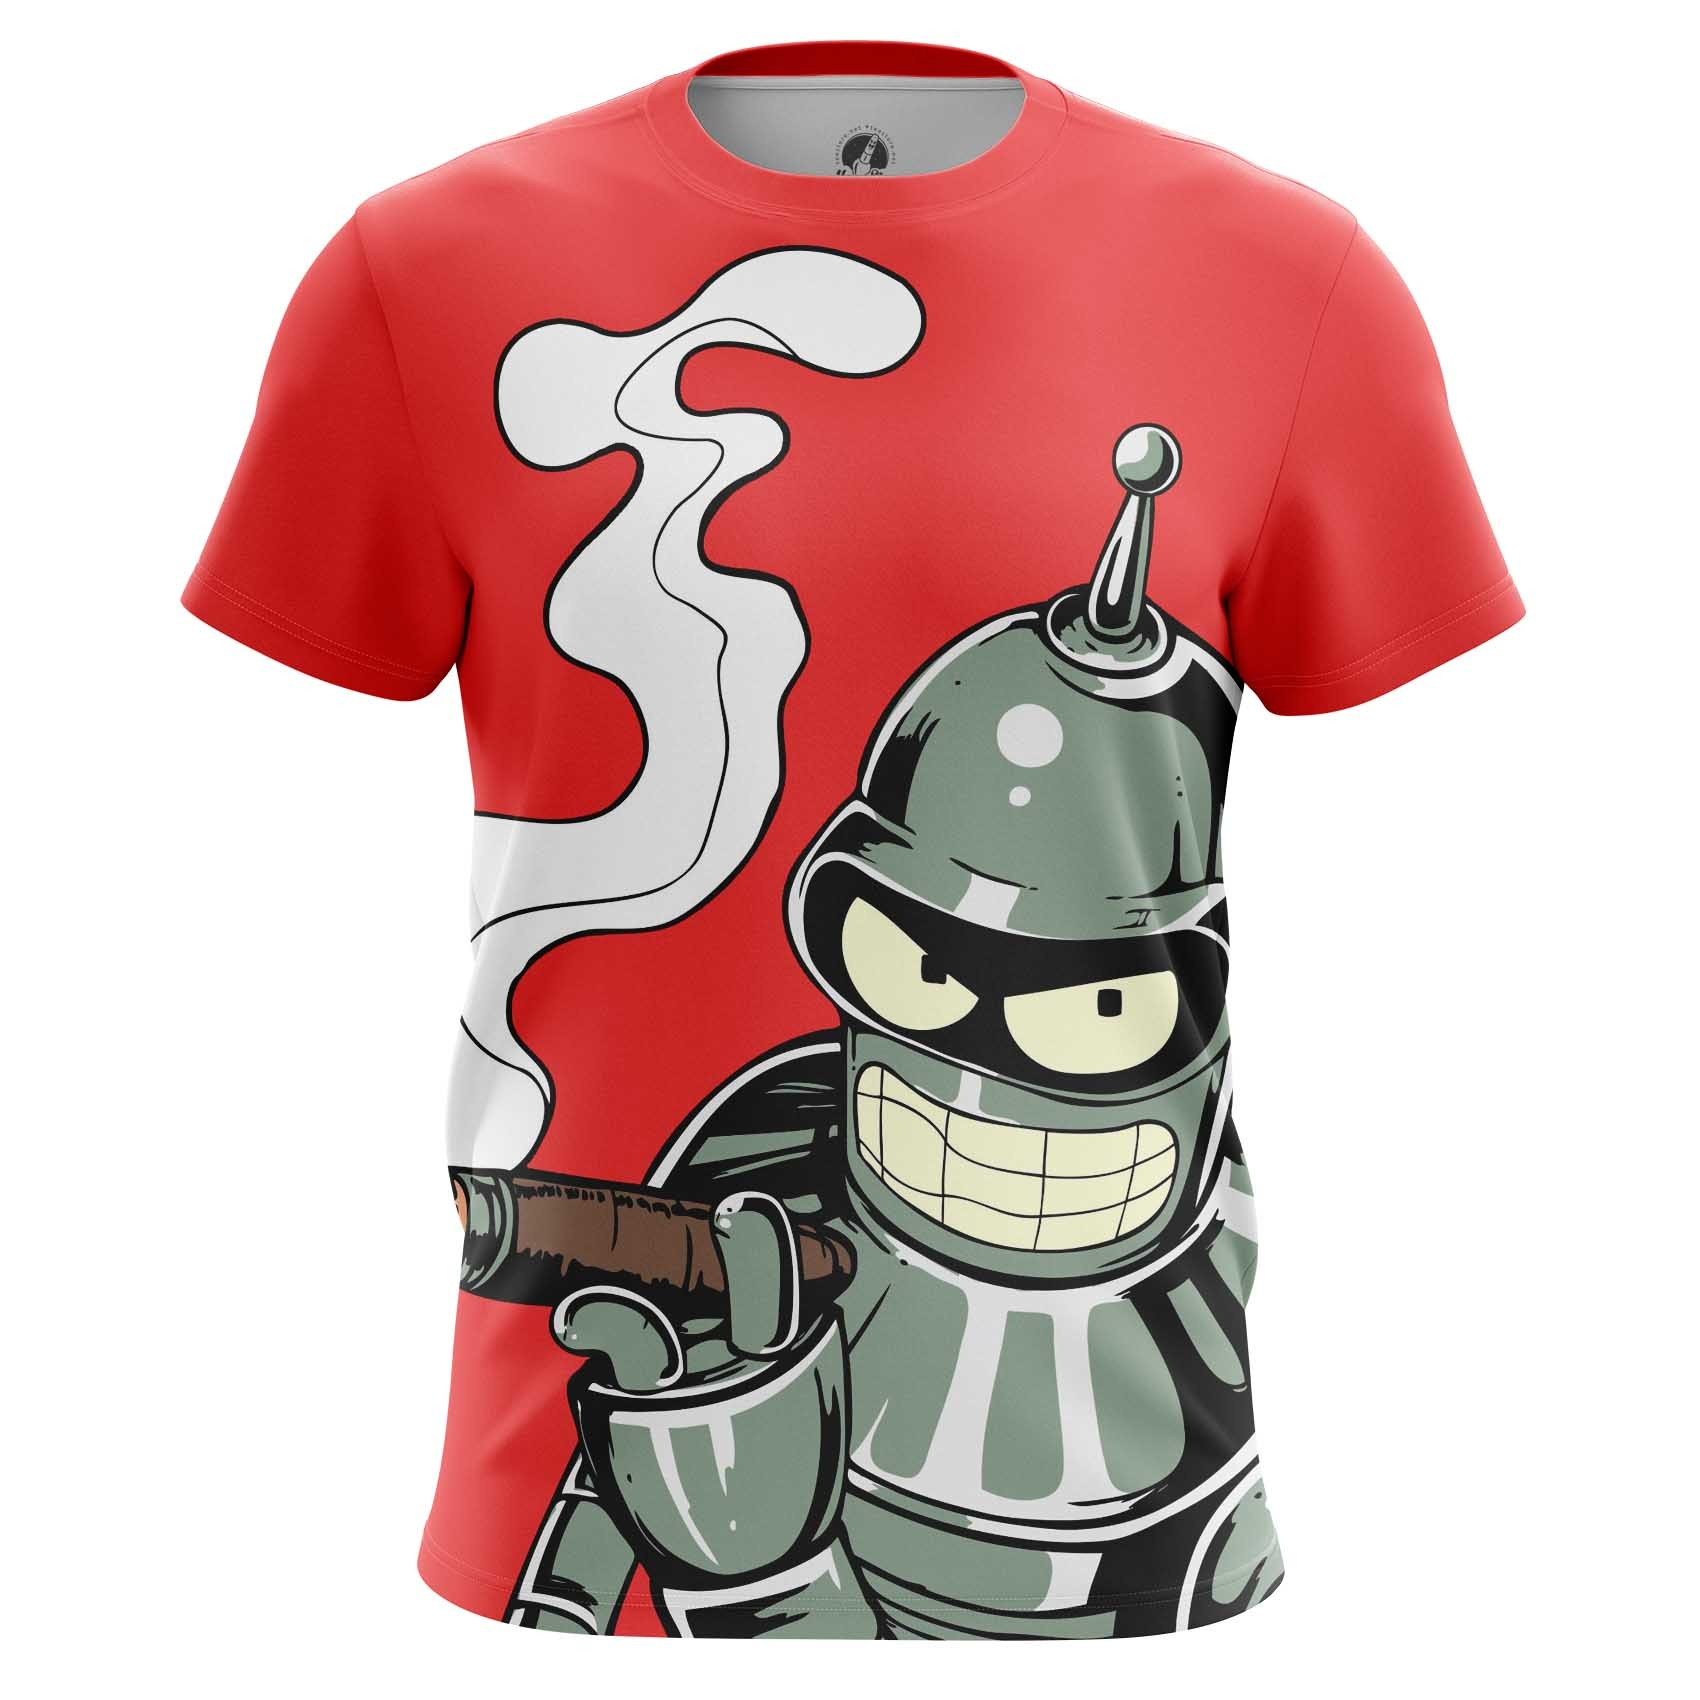 Merch Tank Bender Futurama Tv Series Vest